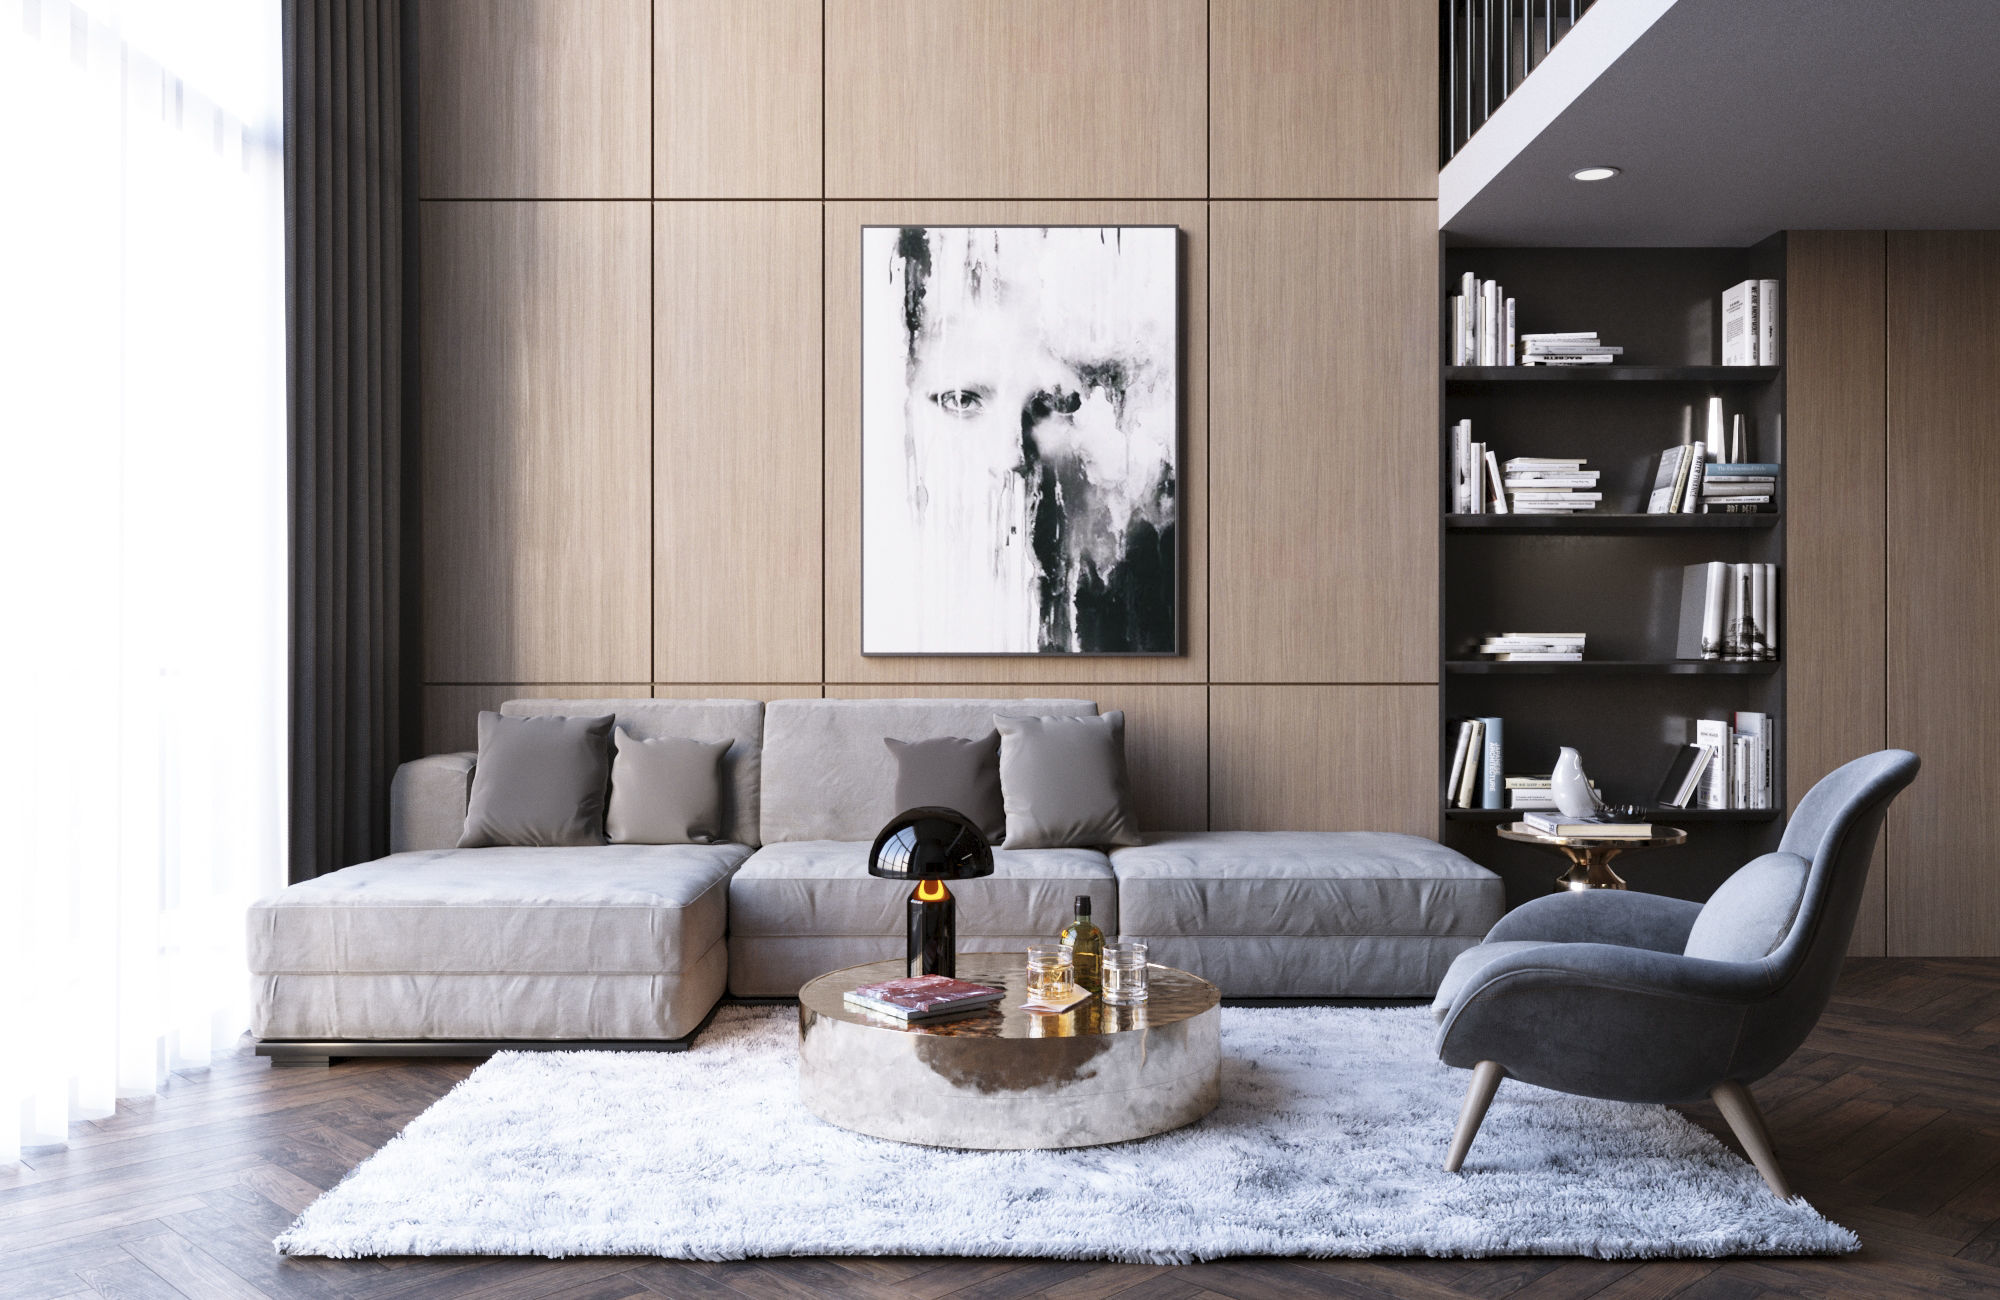 Living Room Kitchen Interior Scene for 3ds Max Corona Render | 3D model